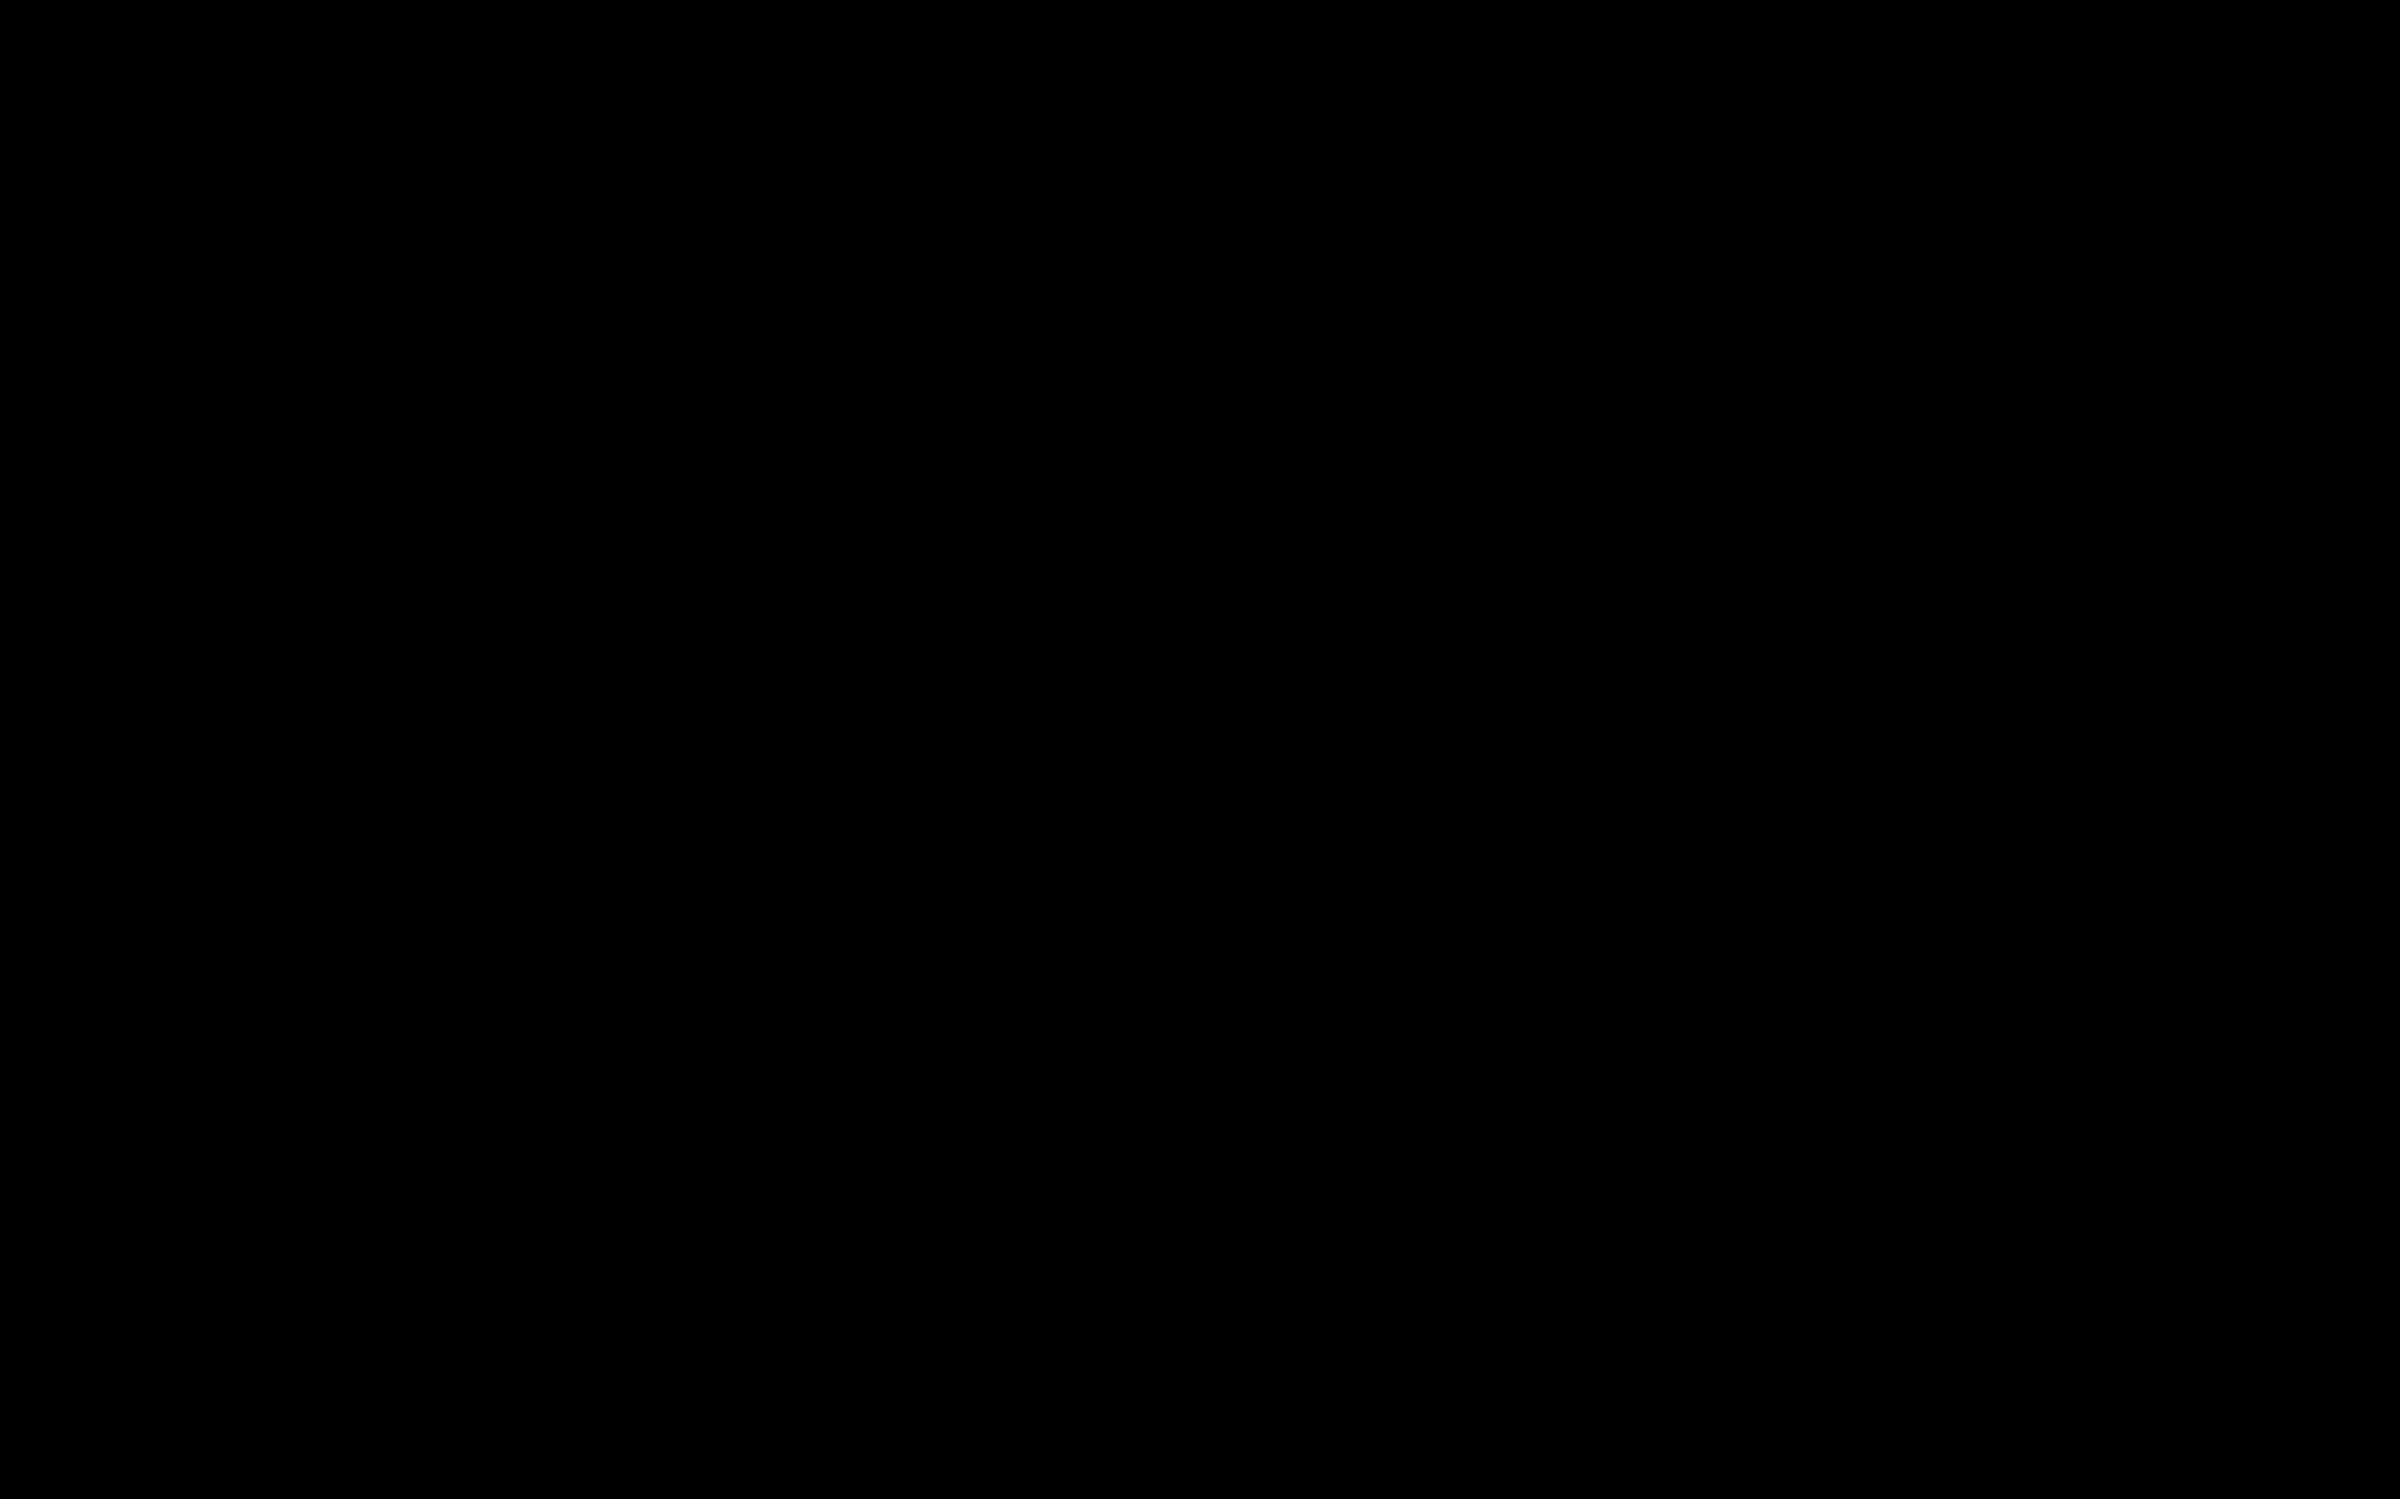 transparent stock Clipart